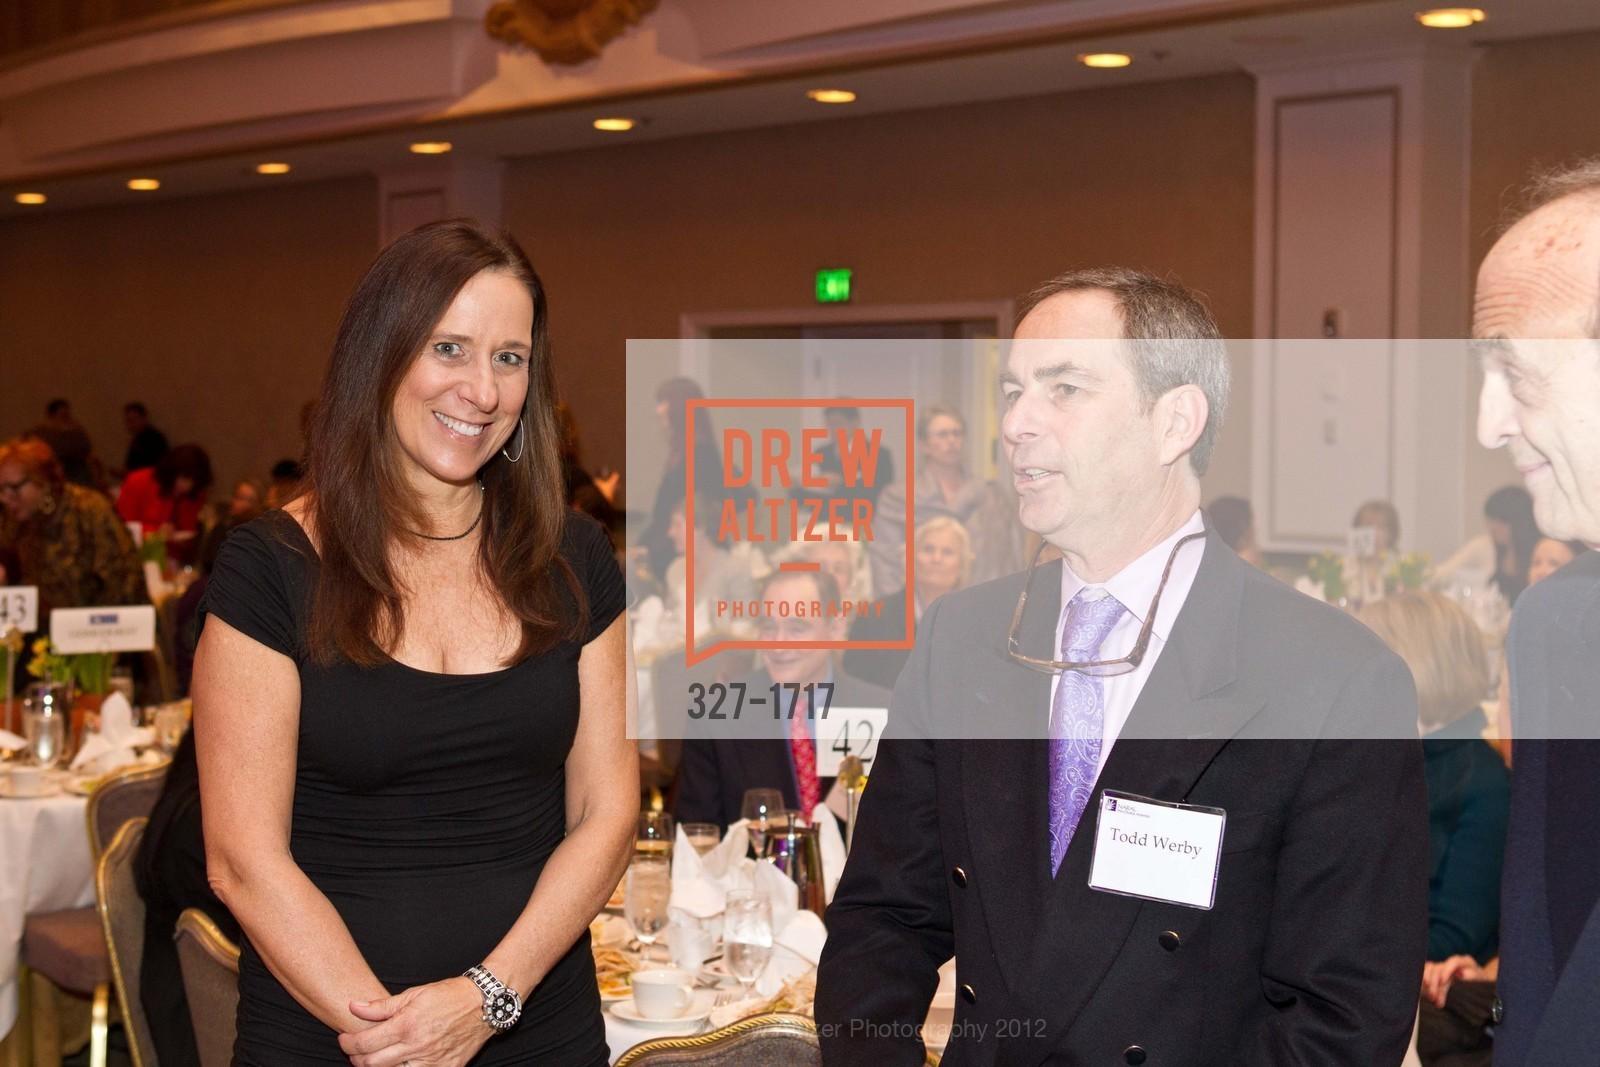 Jill Hamer, Todd Werby, Photo #327-1717